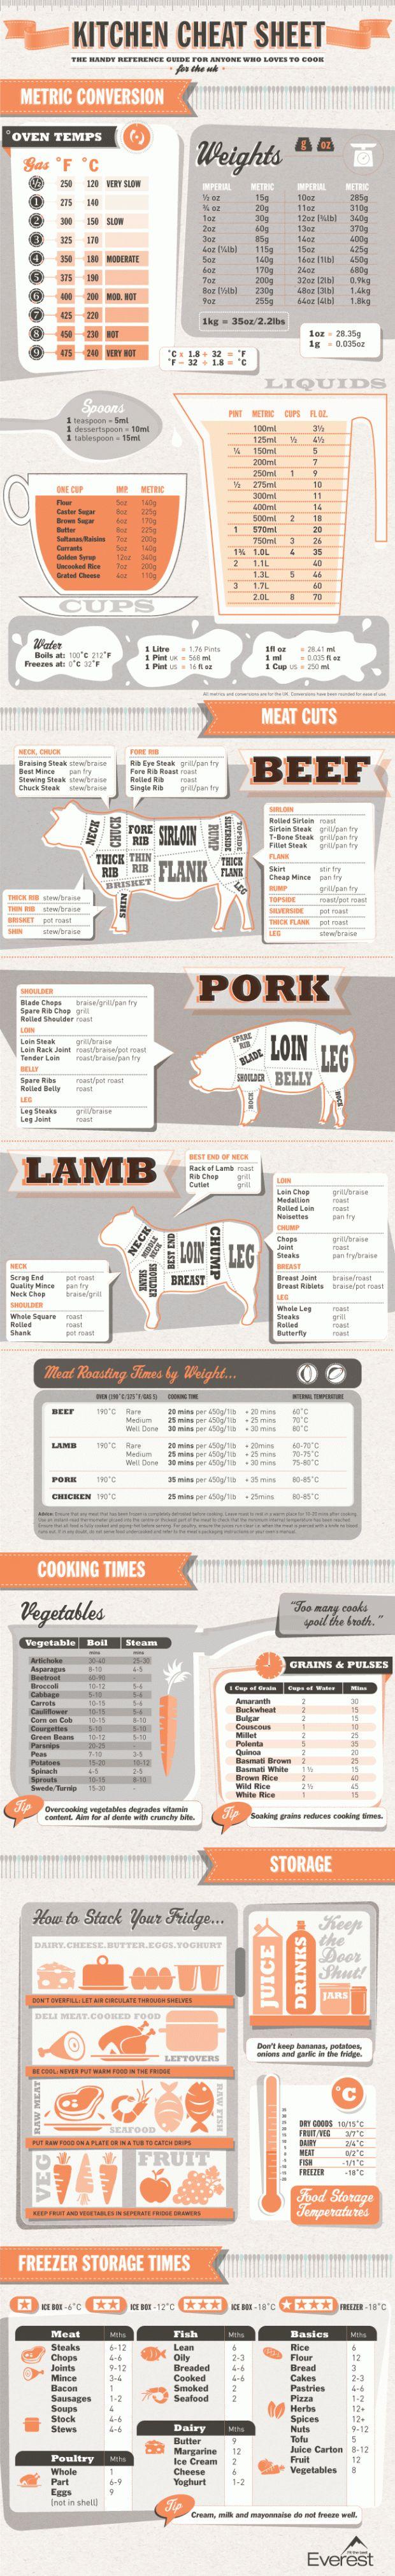 Kitchen Cheat Sheet [infographic]